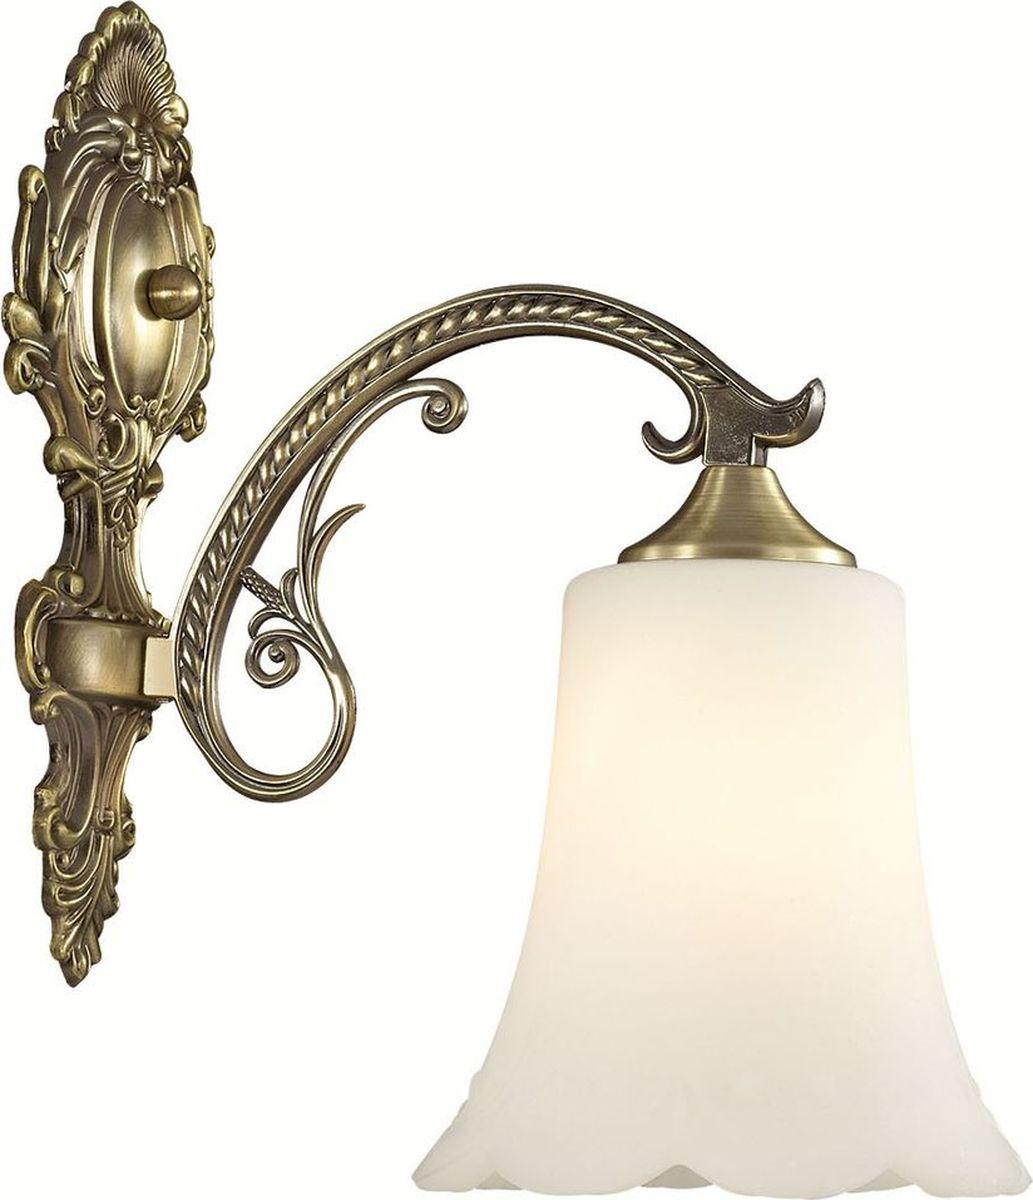 Бра Lumion Sonette, цвет: белый, E27, 60 Вт. 2985/1W2985/1W